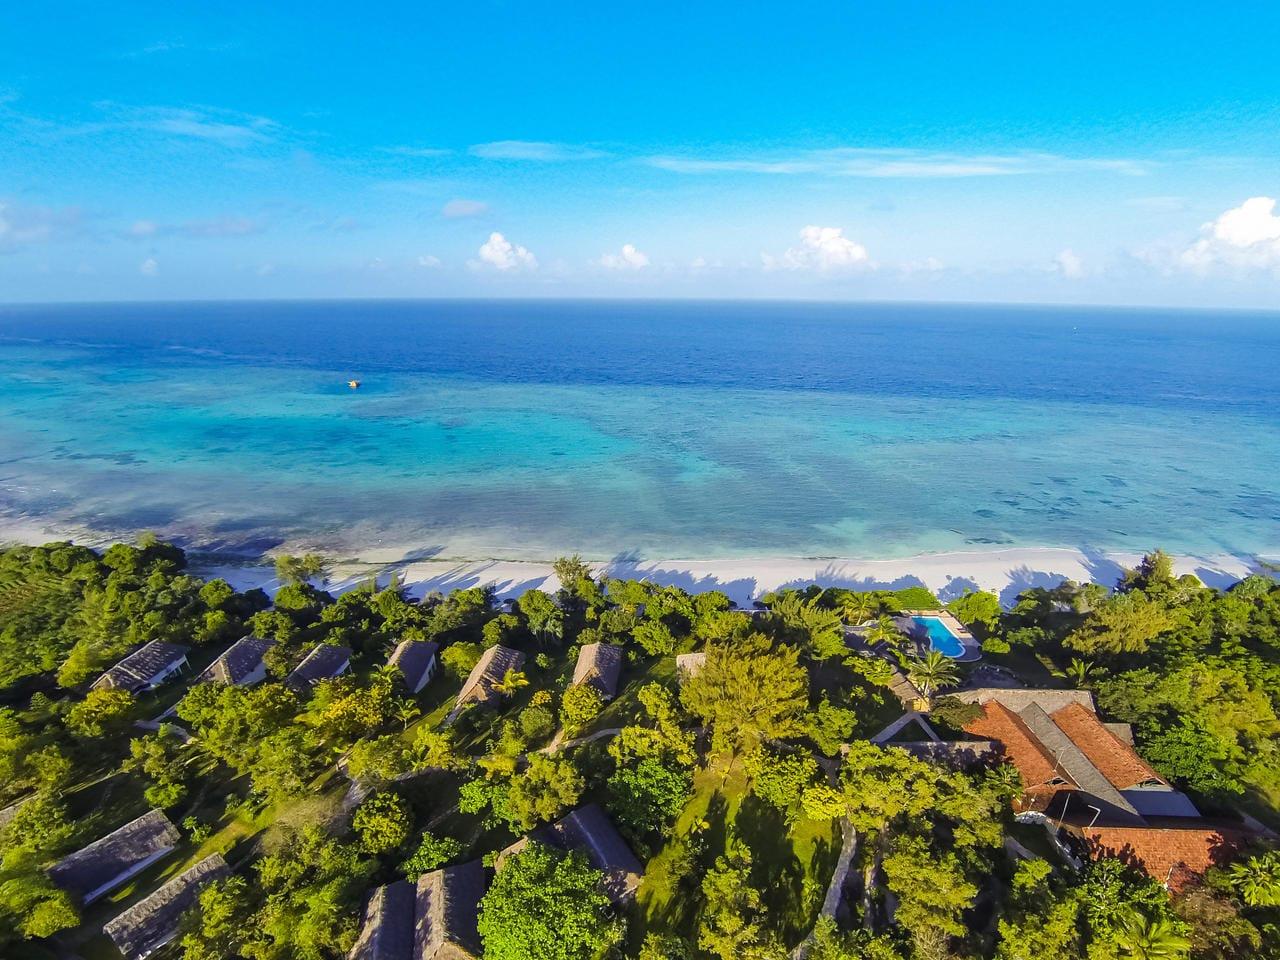 The Manta Aerial View 1